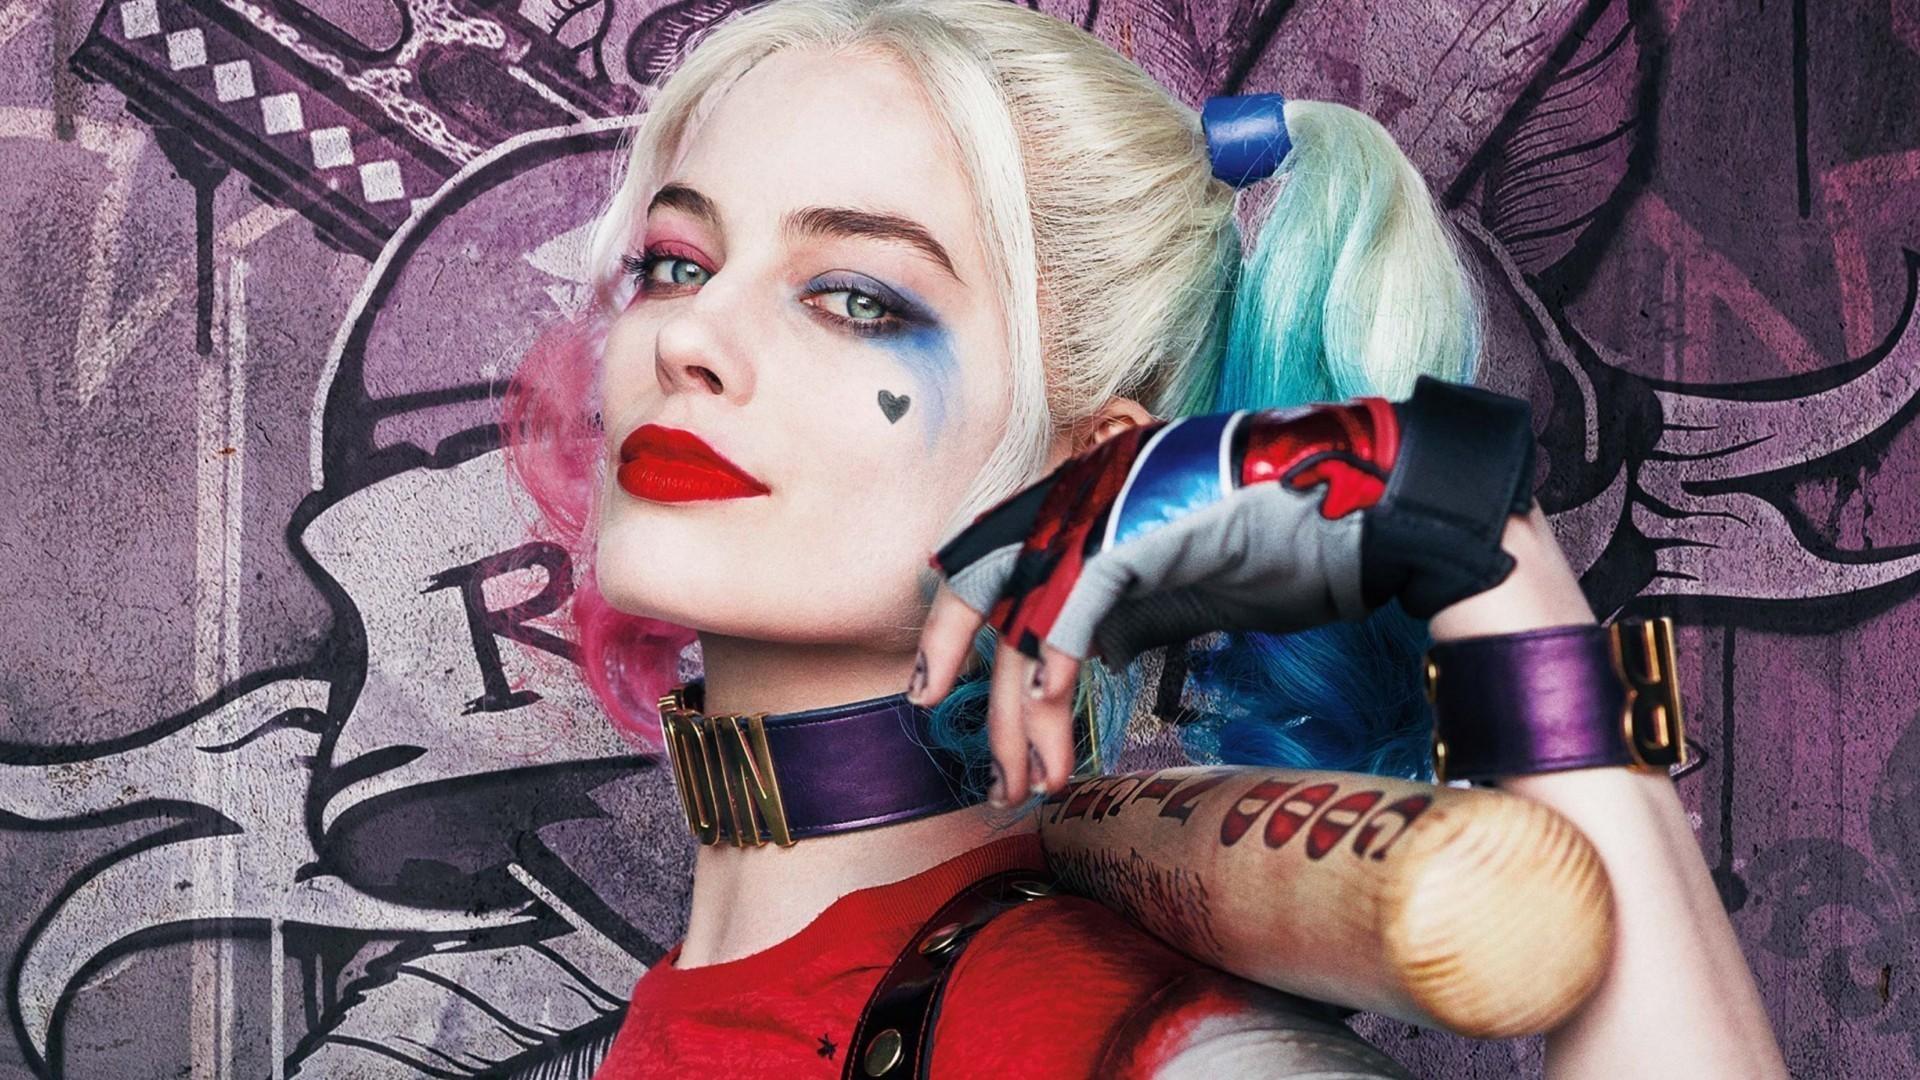 Free Harley Quinn Wallpaper Movie | HD Picturez